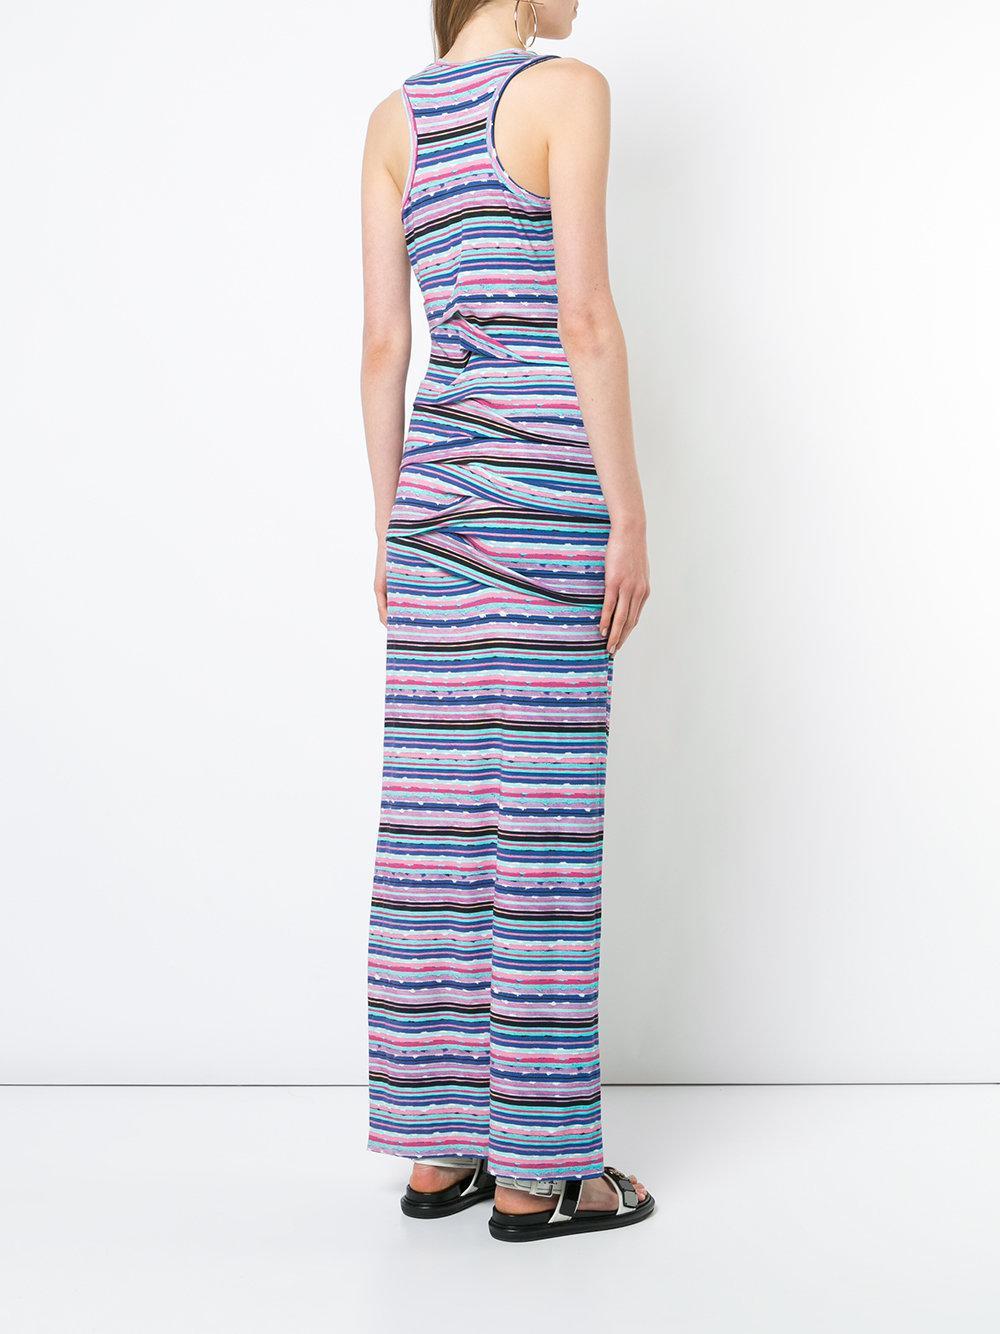 fitted silhouette stripped design dress - Pink & Purple Nicole Miller New Cheap Price mxsiQ1G